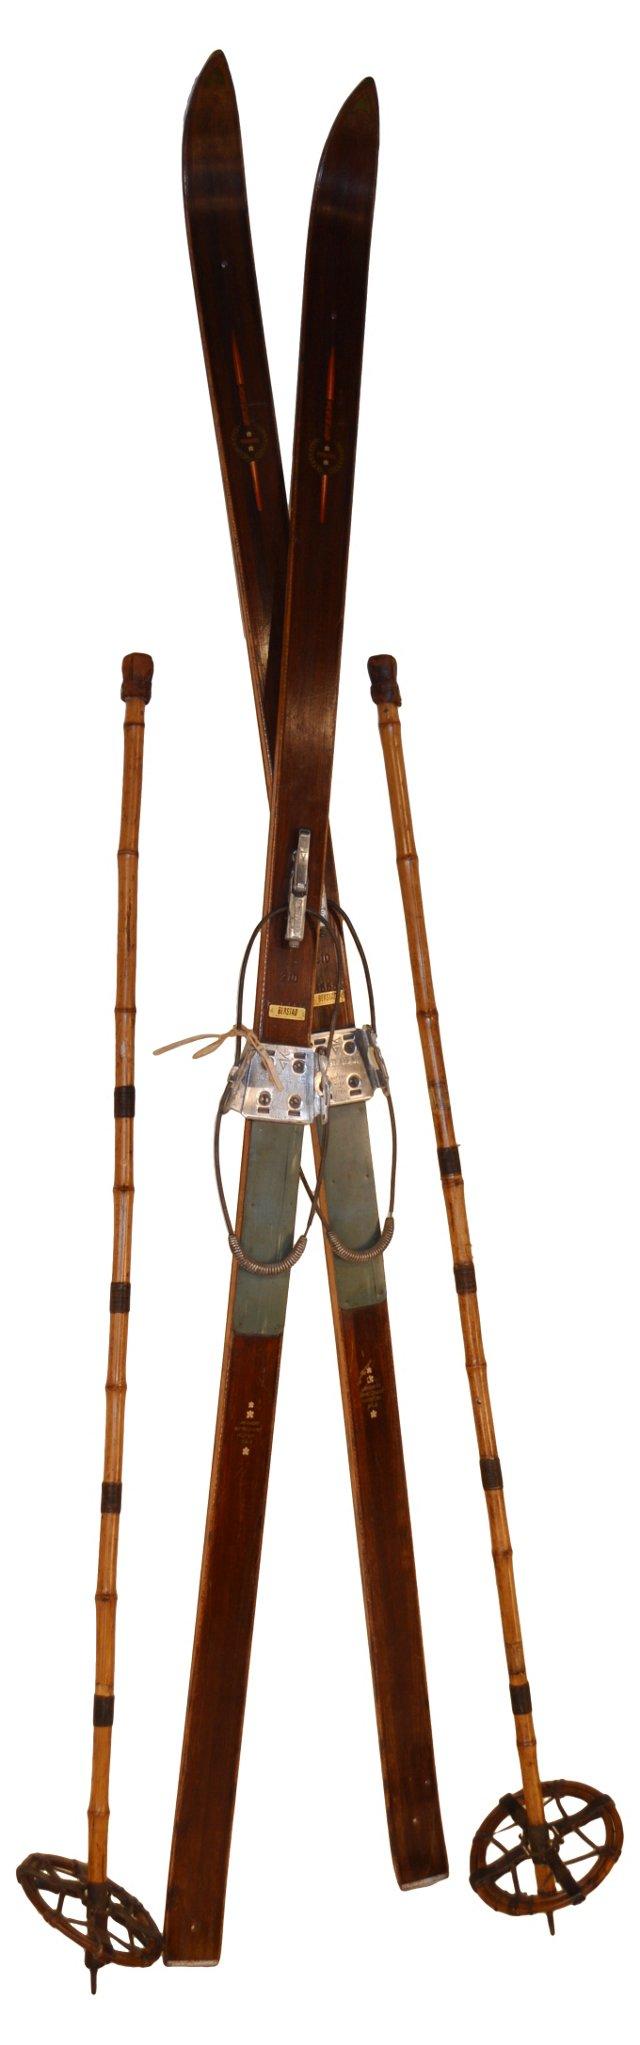 1920s Snow Skis & Poles, 4 Pcs